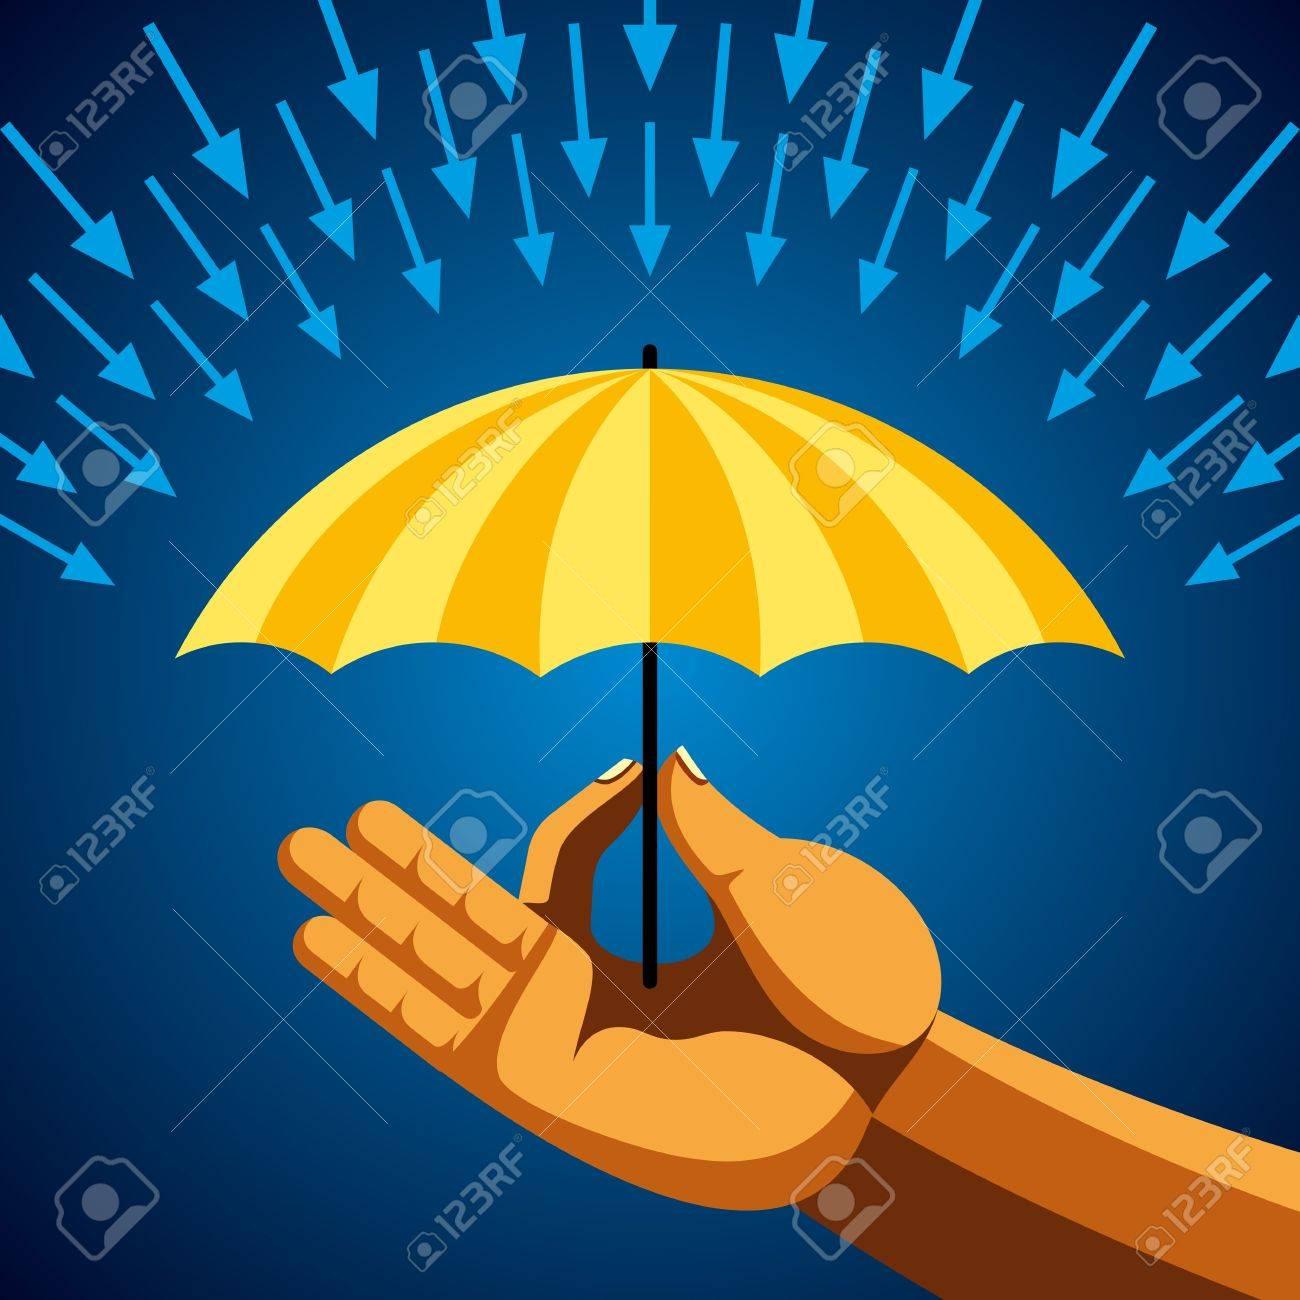 Hand with yellow umbrella Stock Vector - 18181441